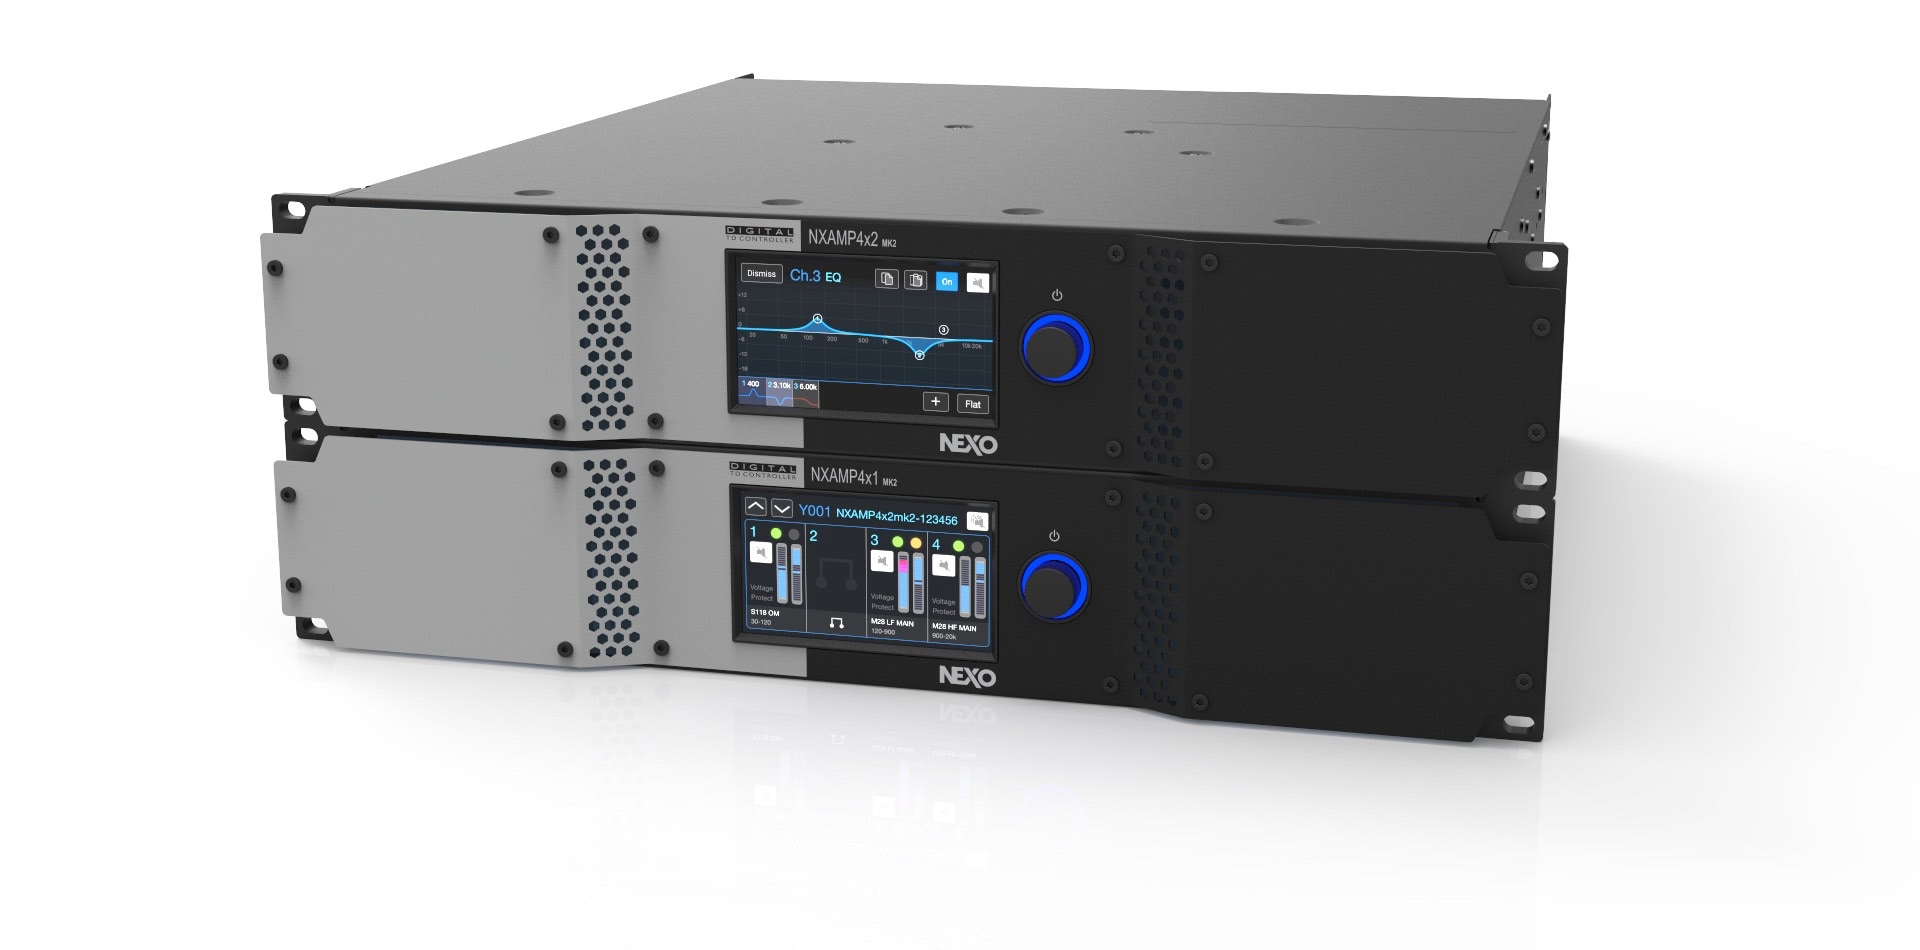 Yamaha Announces Two New Nxamp Mk2 Nexo Amplifiers